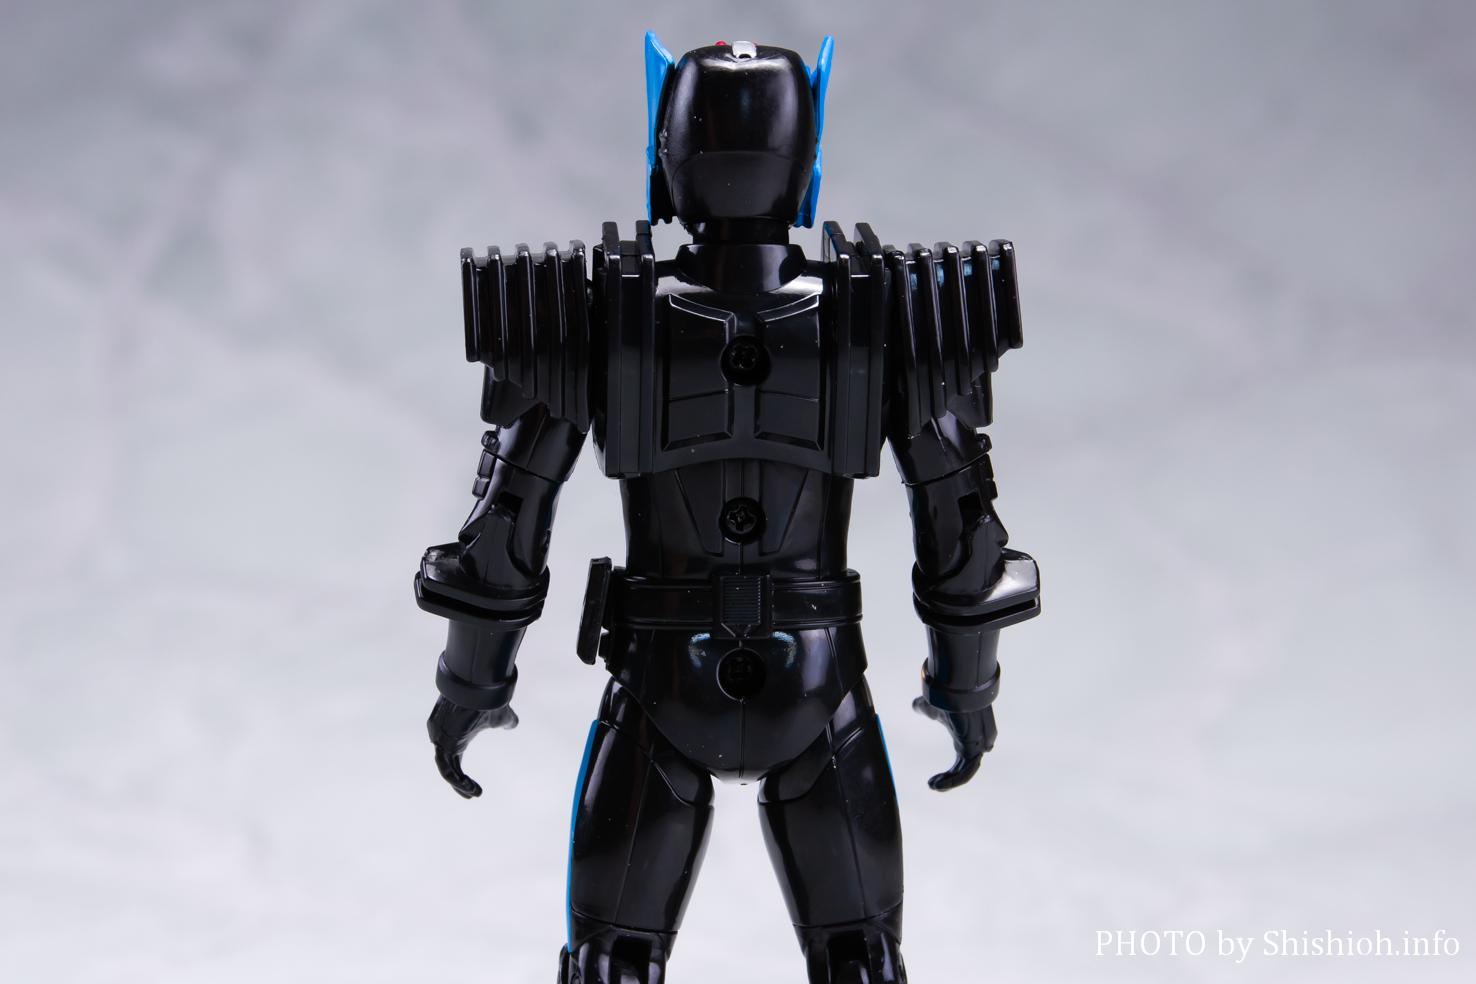 RKF レジェンドライダーシリーズ 仮面ライダーディエンド